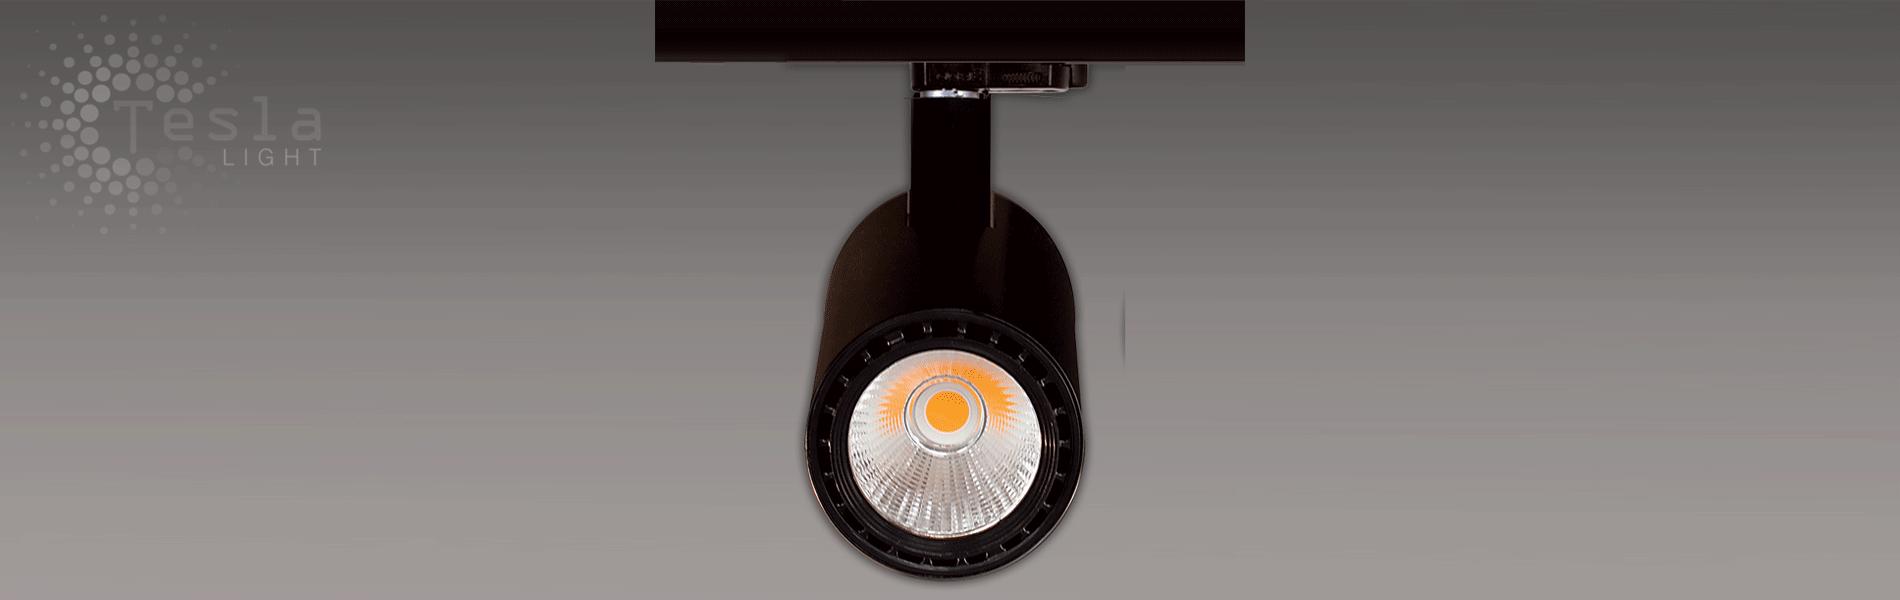 moder-line-y-A-1900x600-copy-clean